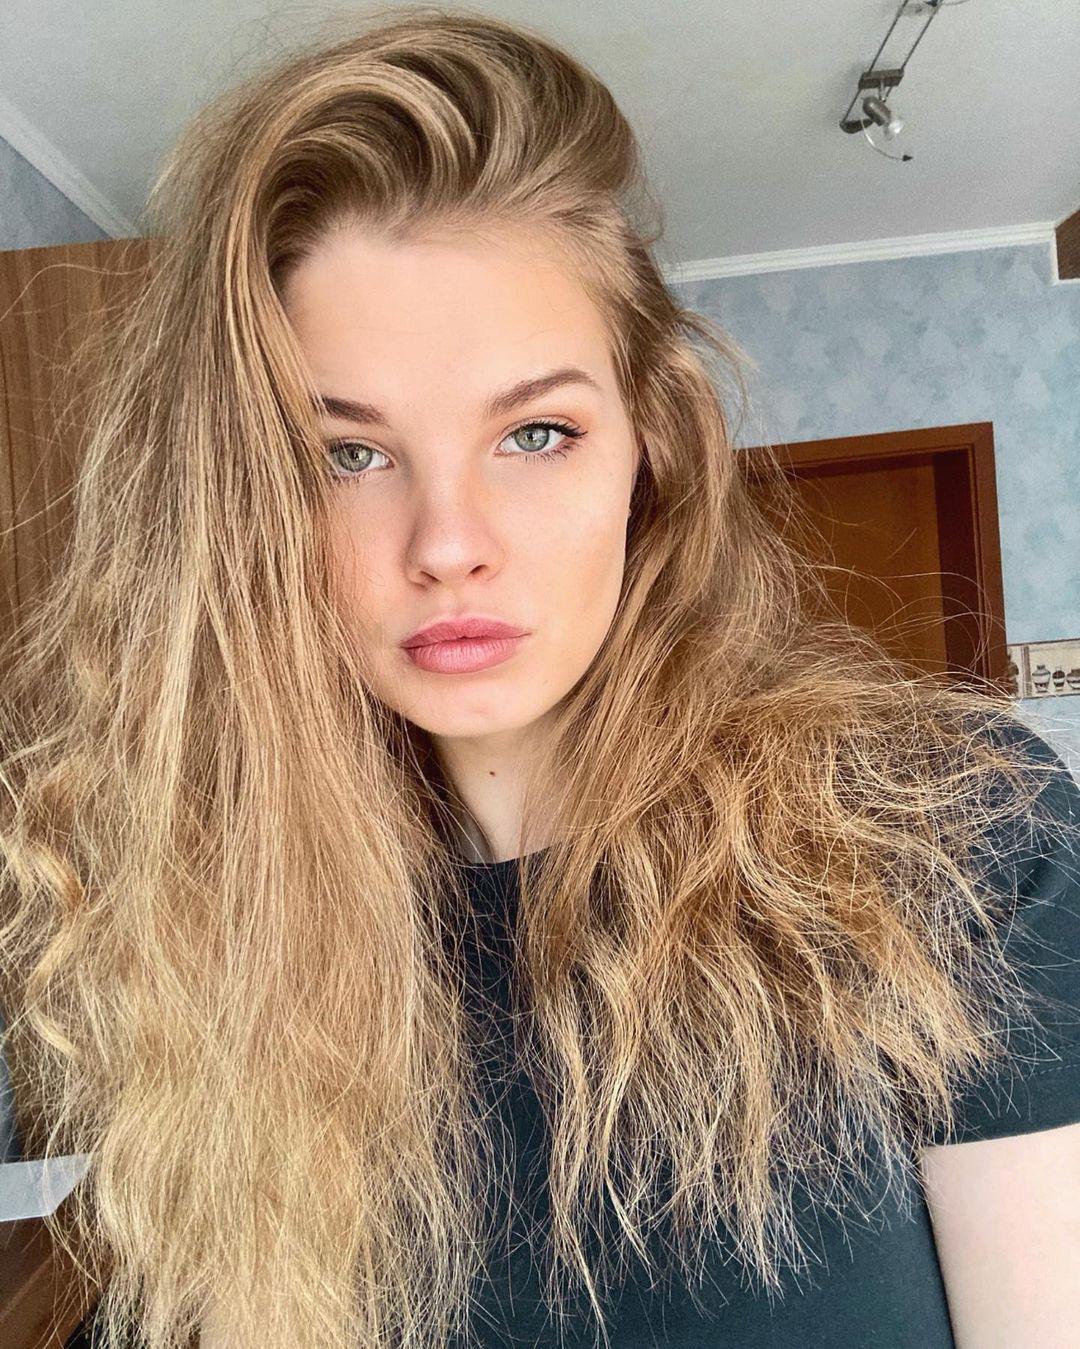 Mariia-Arsentieva-Wallpapers-Insta-Fit-Bio-17